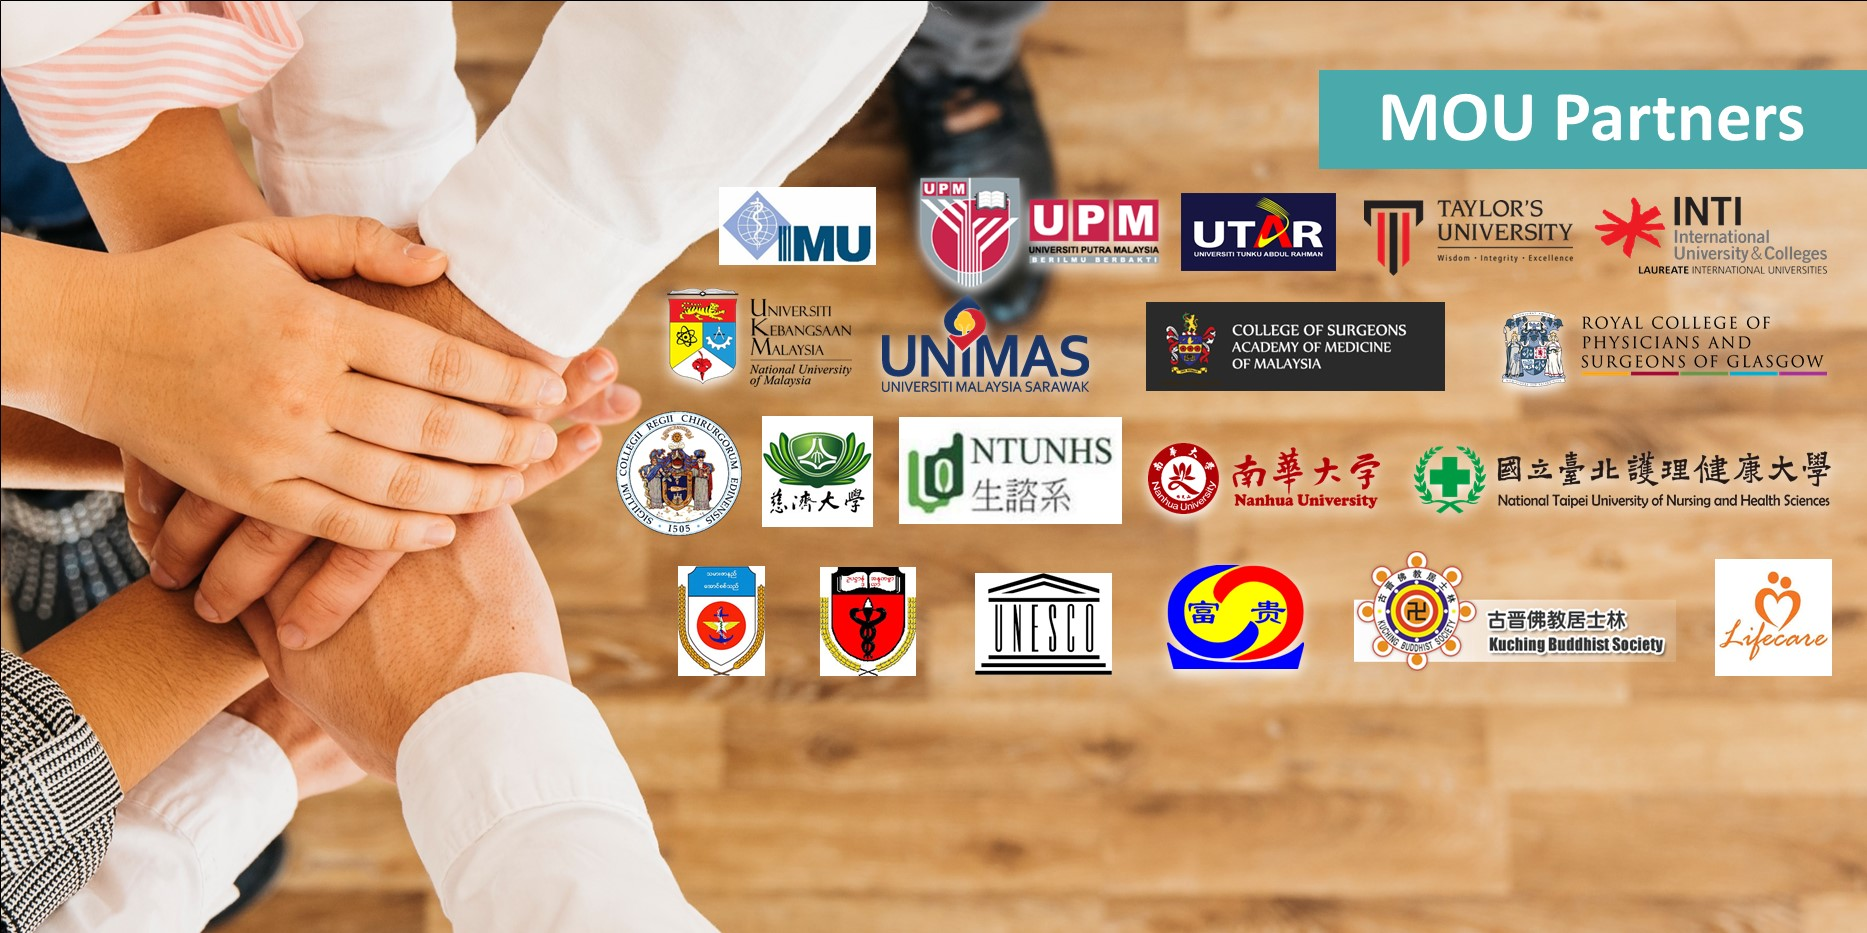 MOU Partners